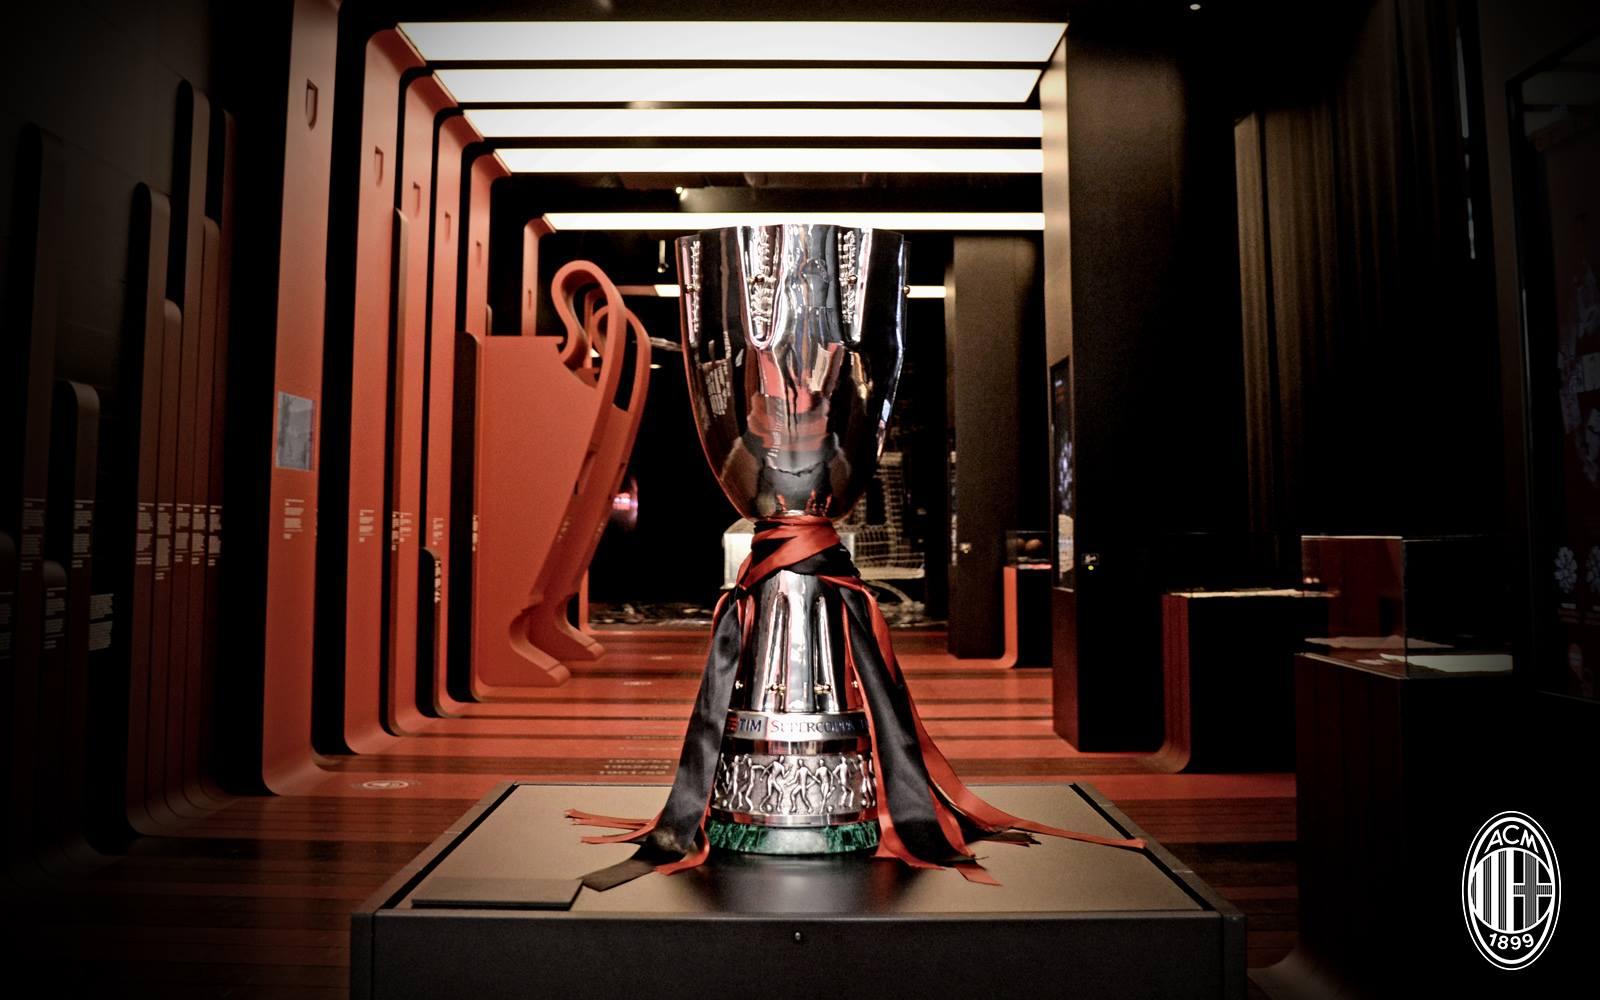 La Supercoppa 2016 è arrivata a Casa Milan! Fonte foto: A.C. Milan